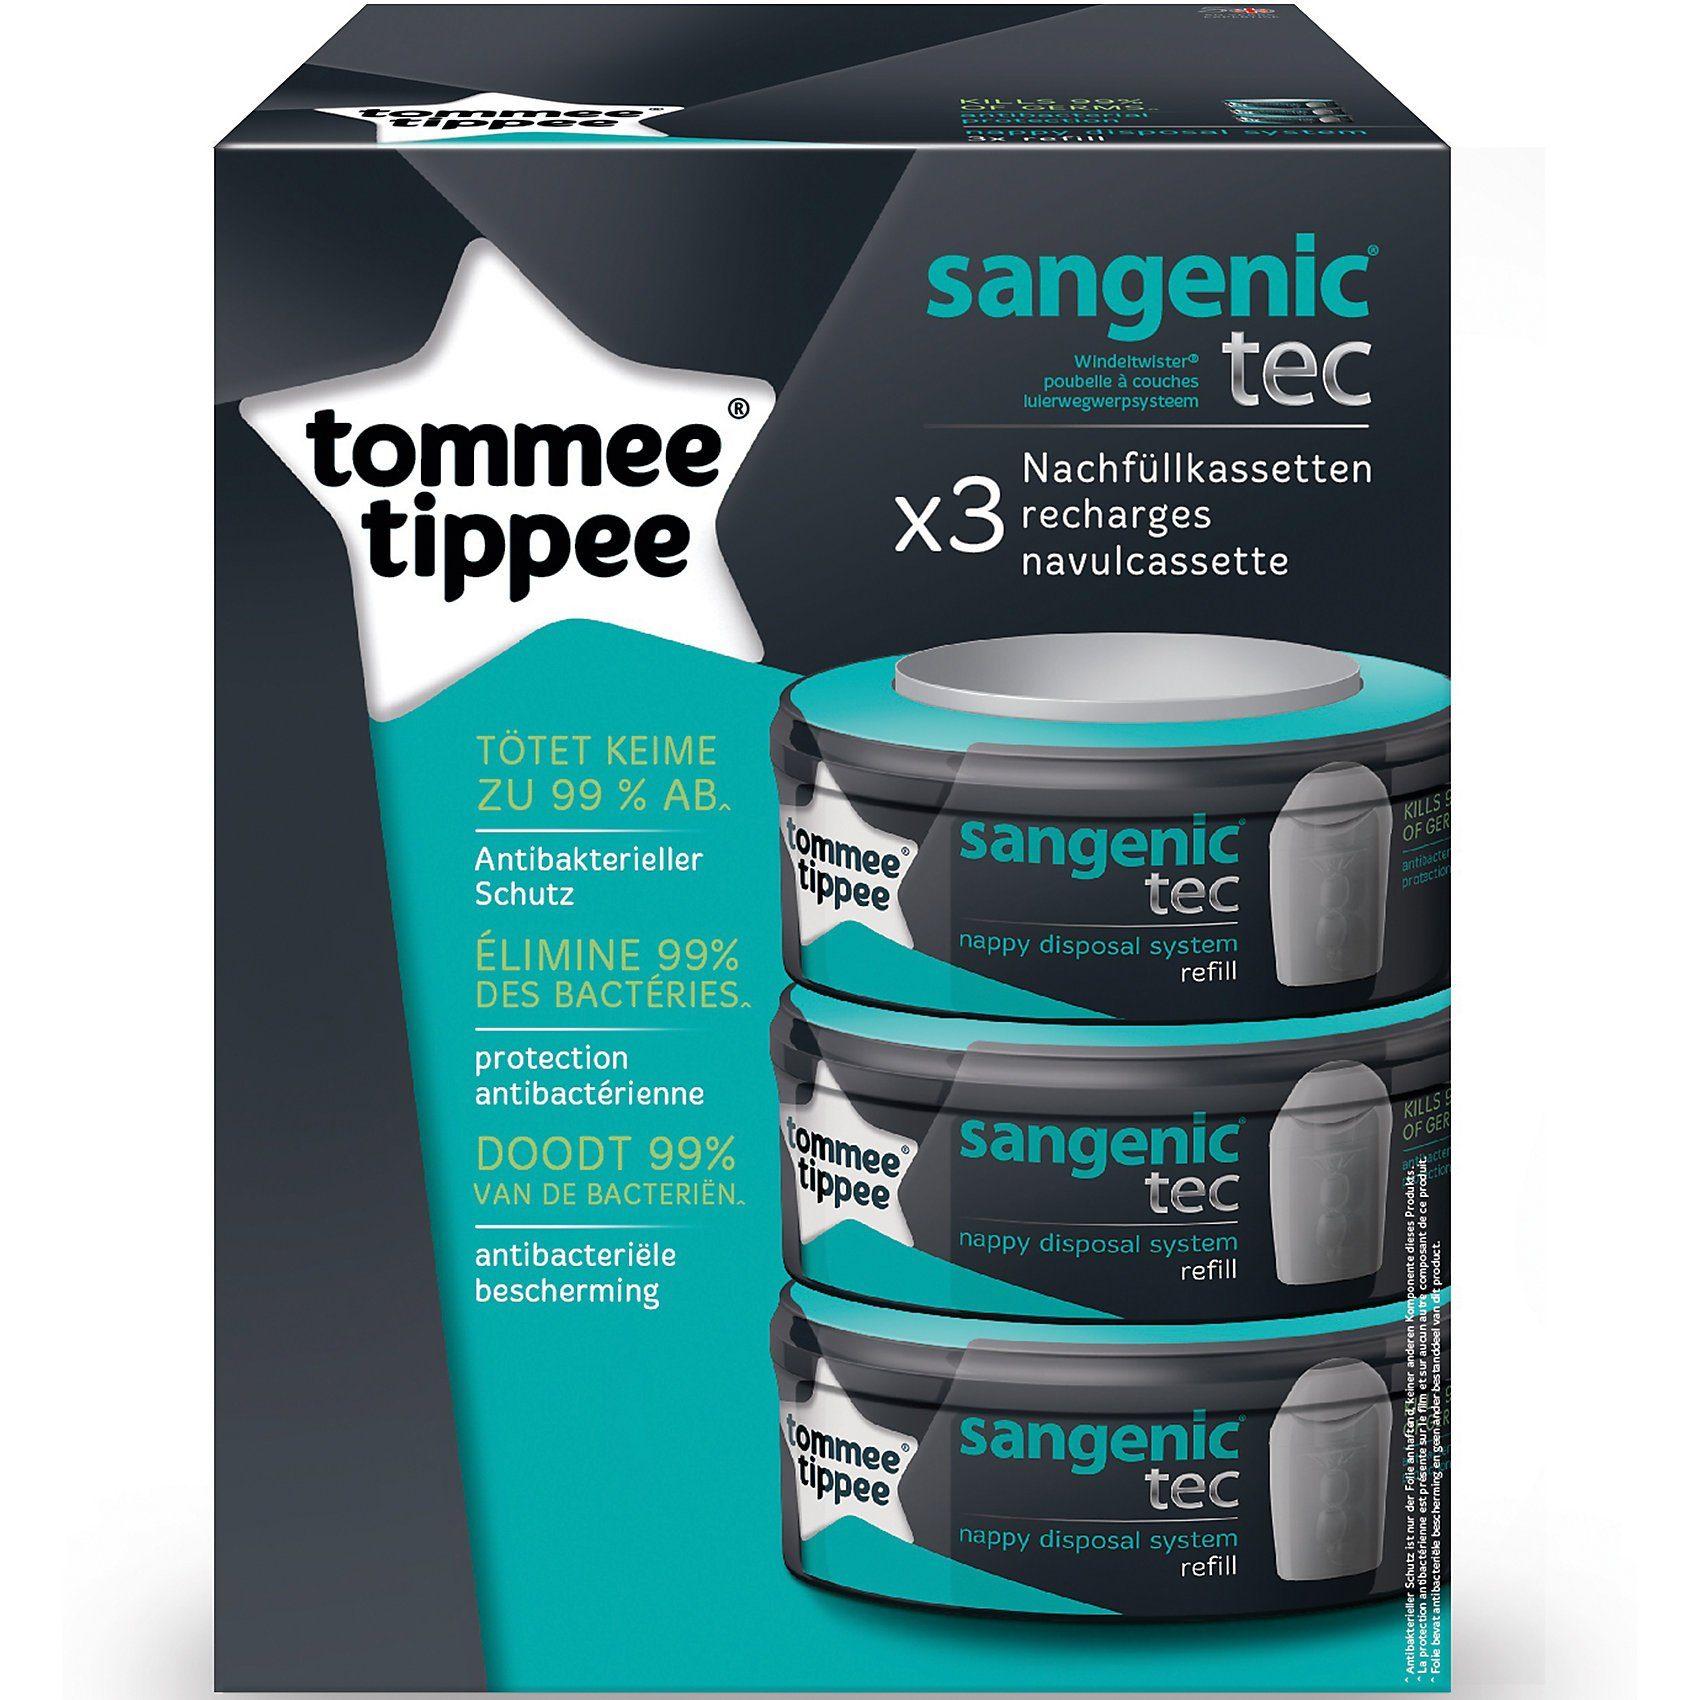 Tommee Tippee Sangenic tec Windeltwister 3er-Packung Nachfüllkassette